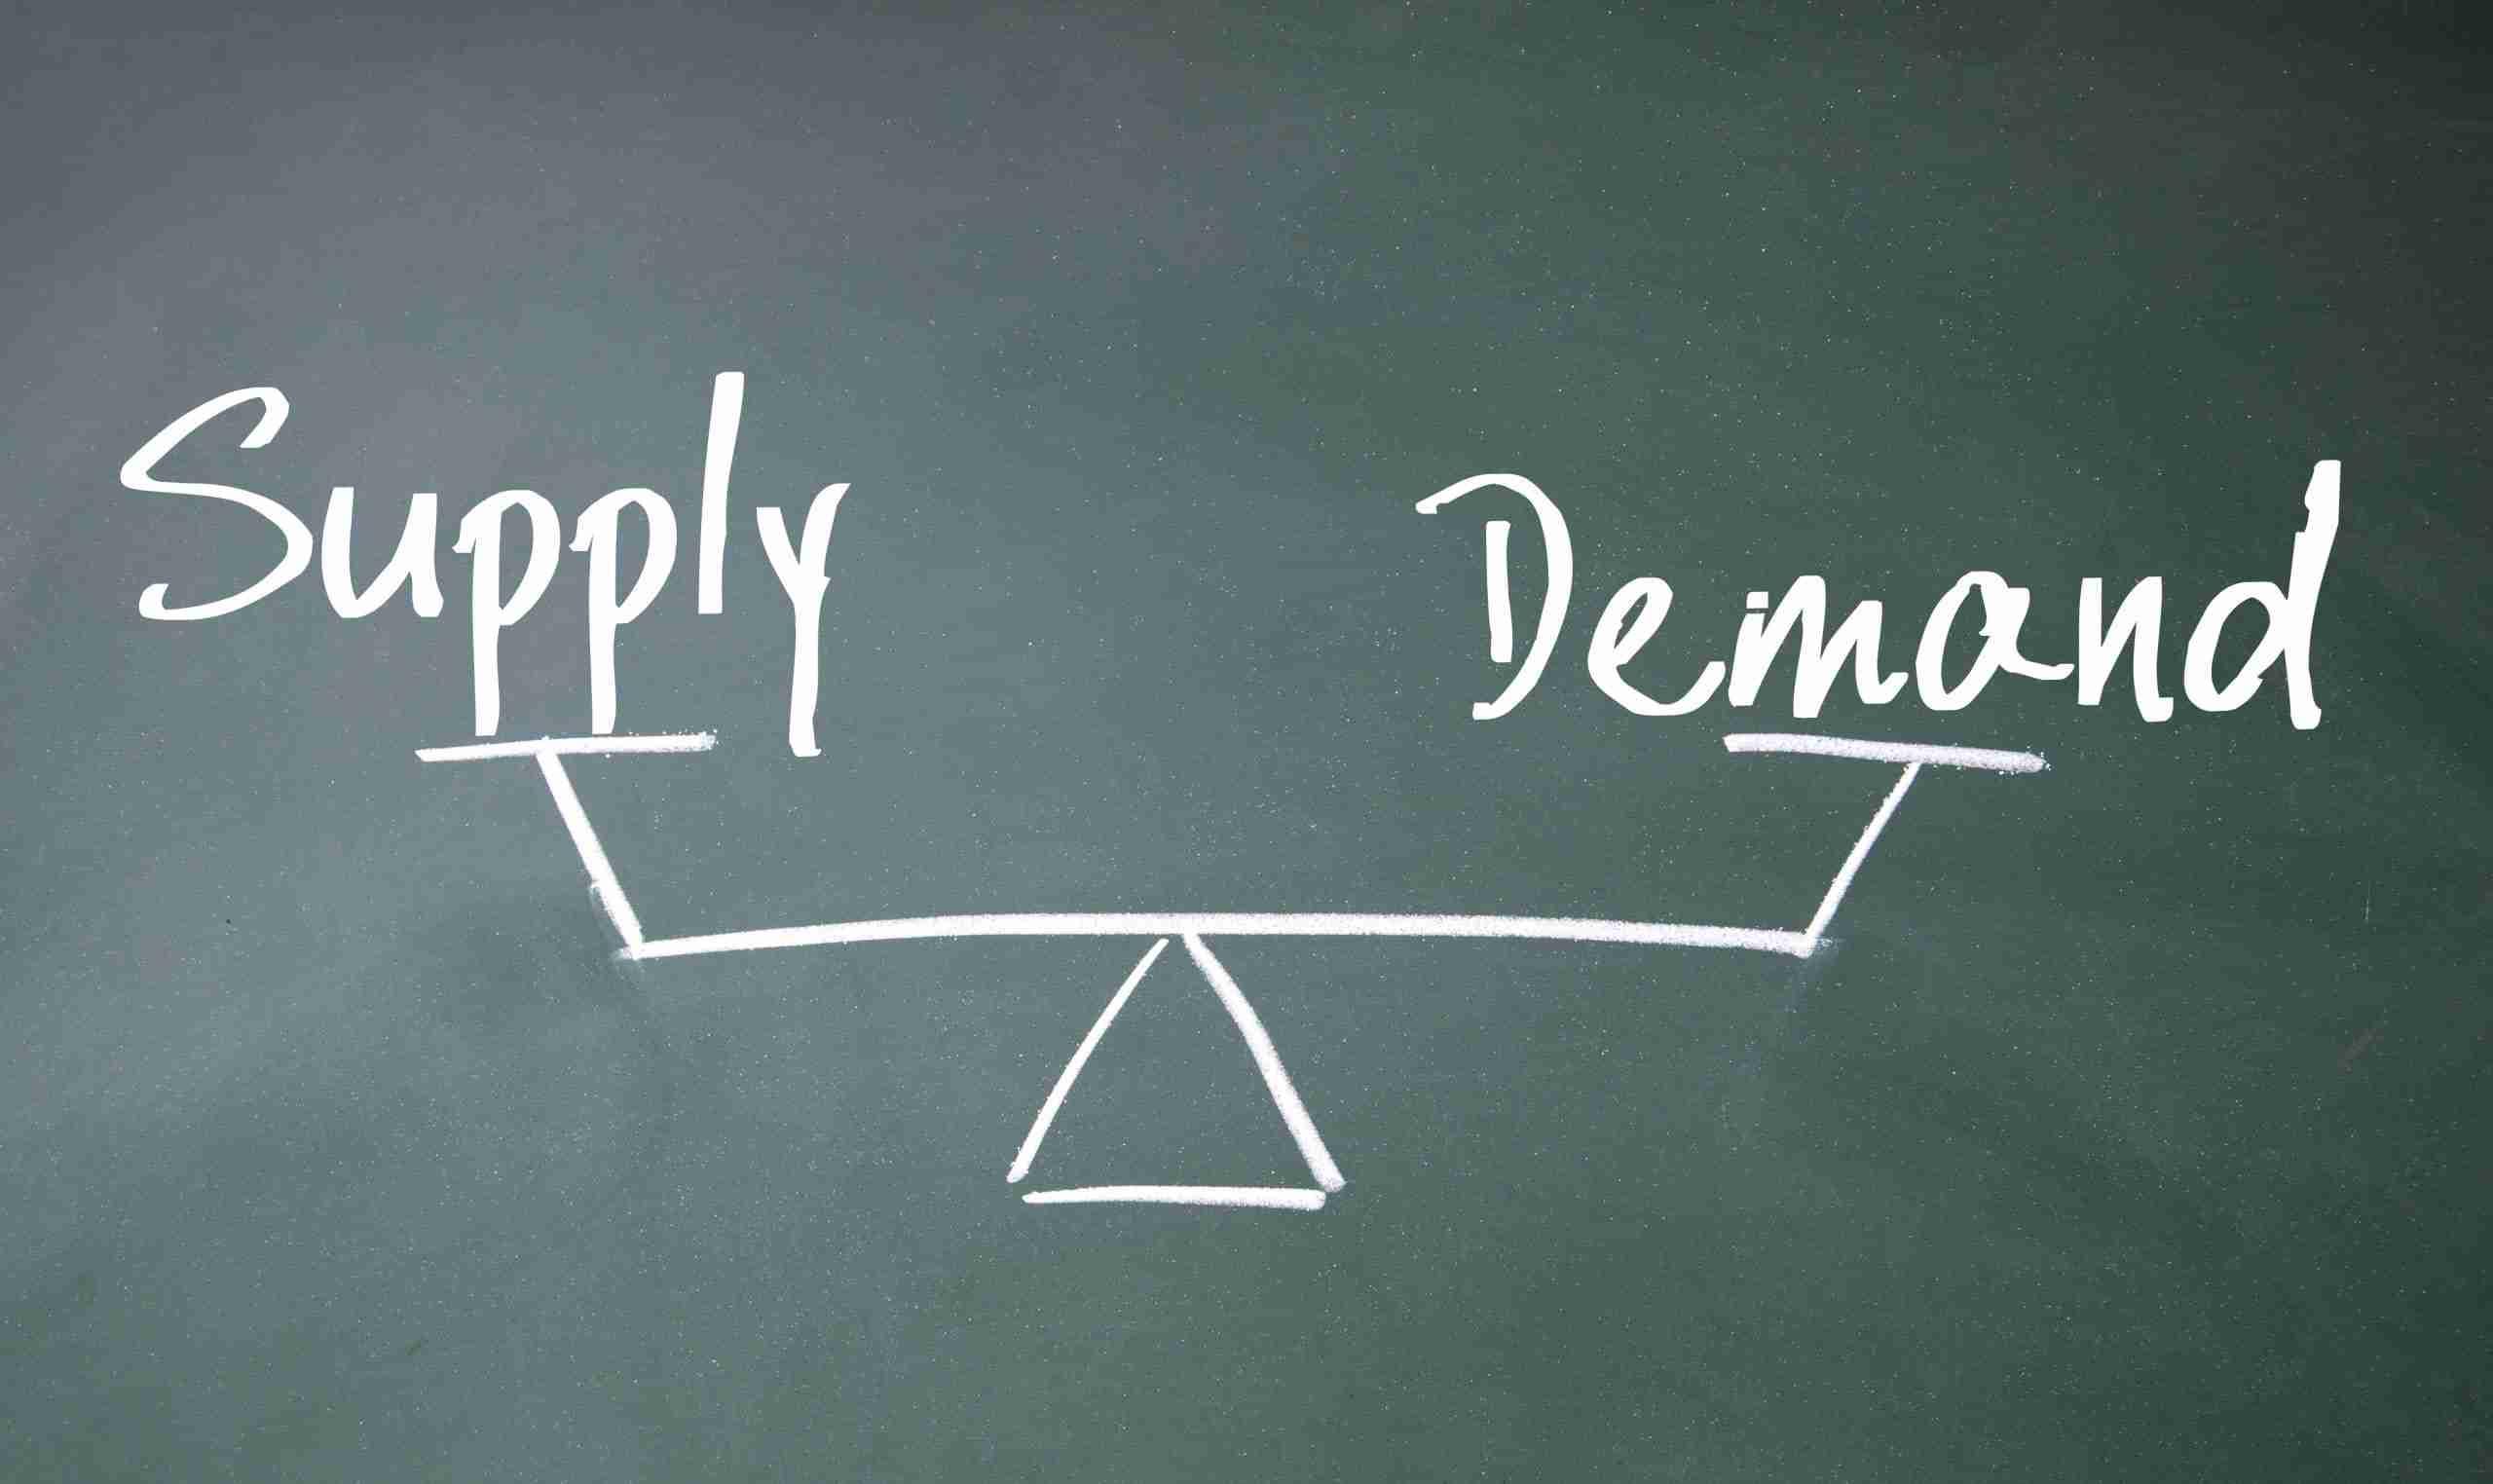 Supply & Demand chalkboard